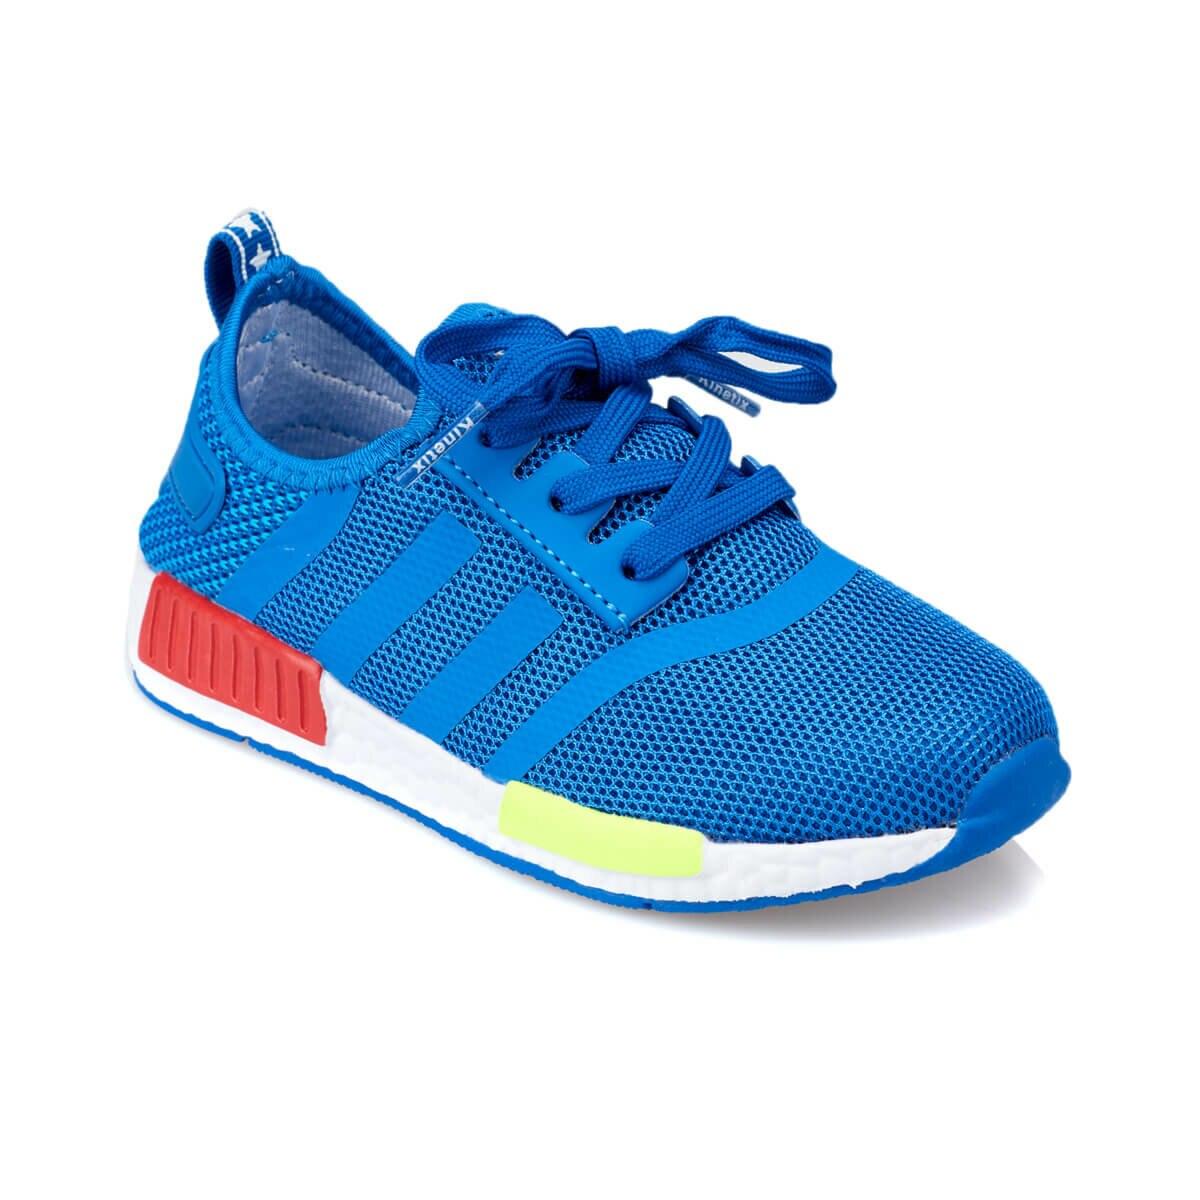 FLO NEPAL Saks Male Child Sneaker Shoes KINETIX